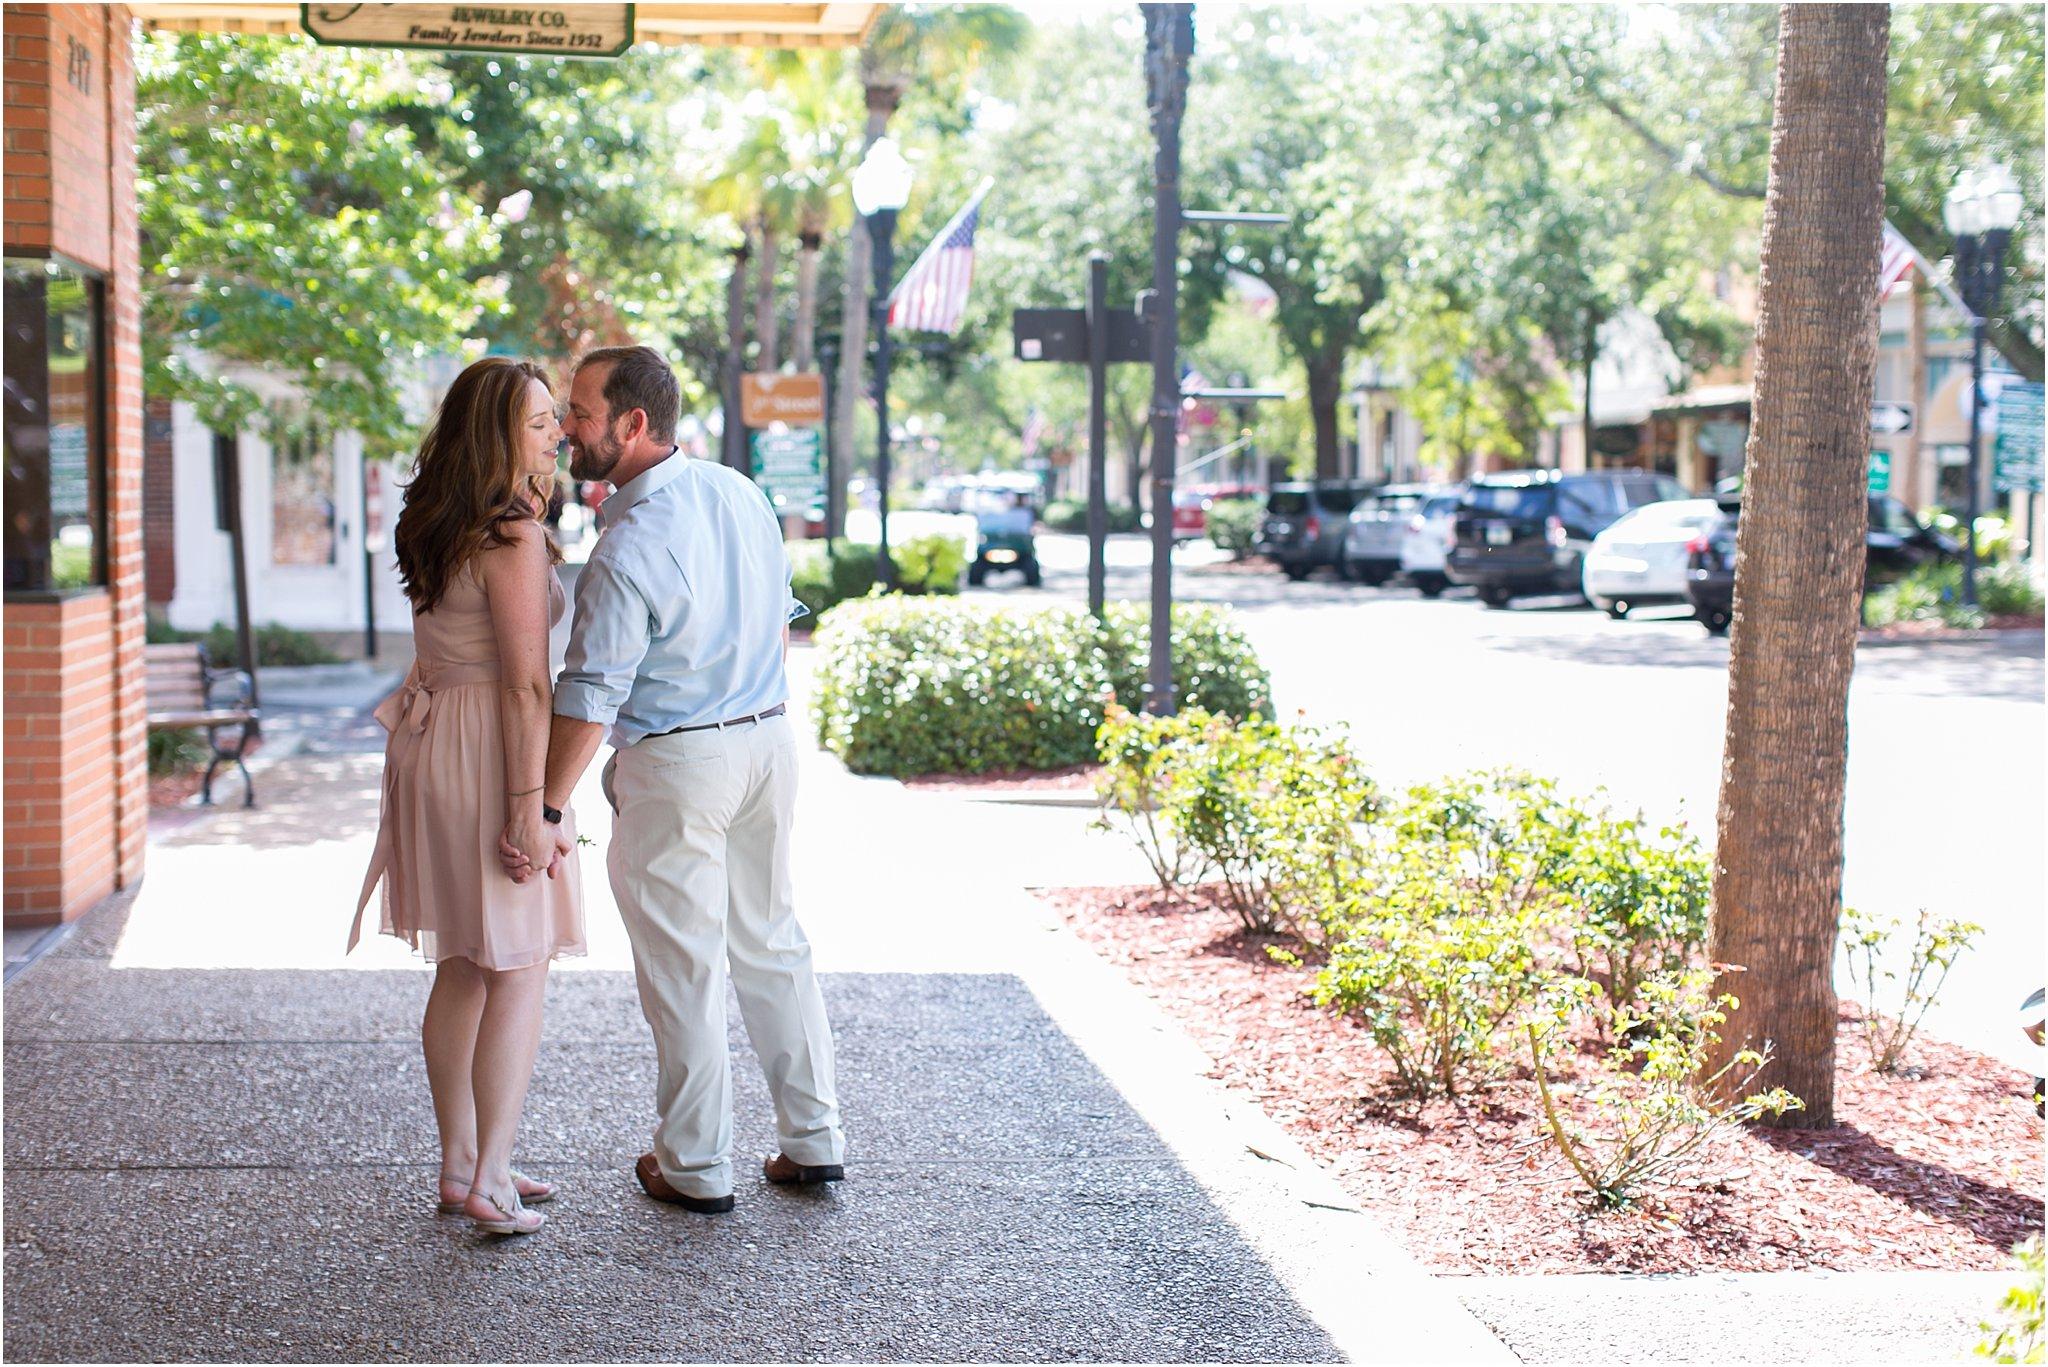 jessica_ryan_photography_wedding_photographs_virginia_fernandina_beach_florida_wedding_2127